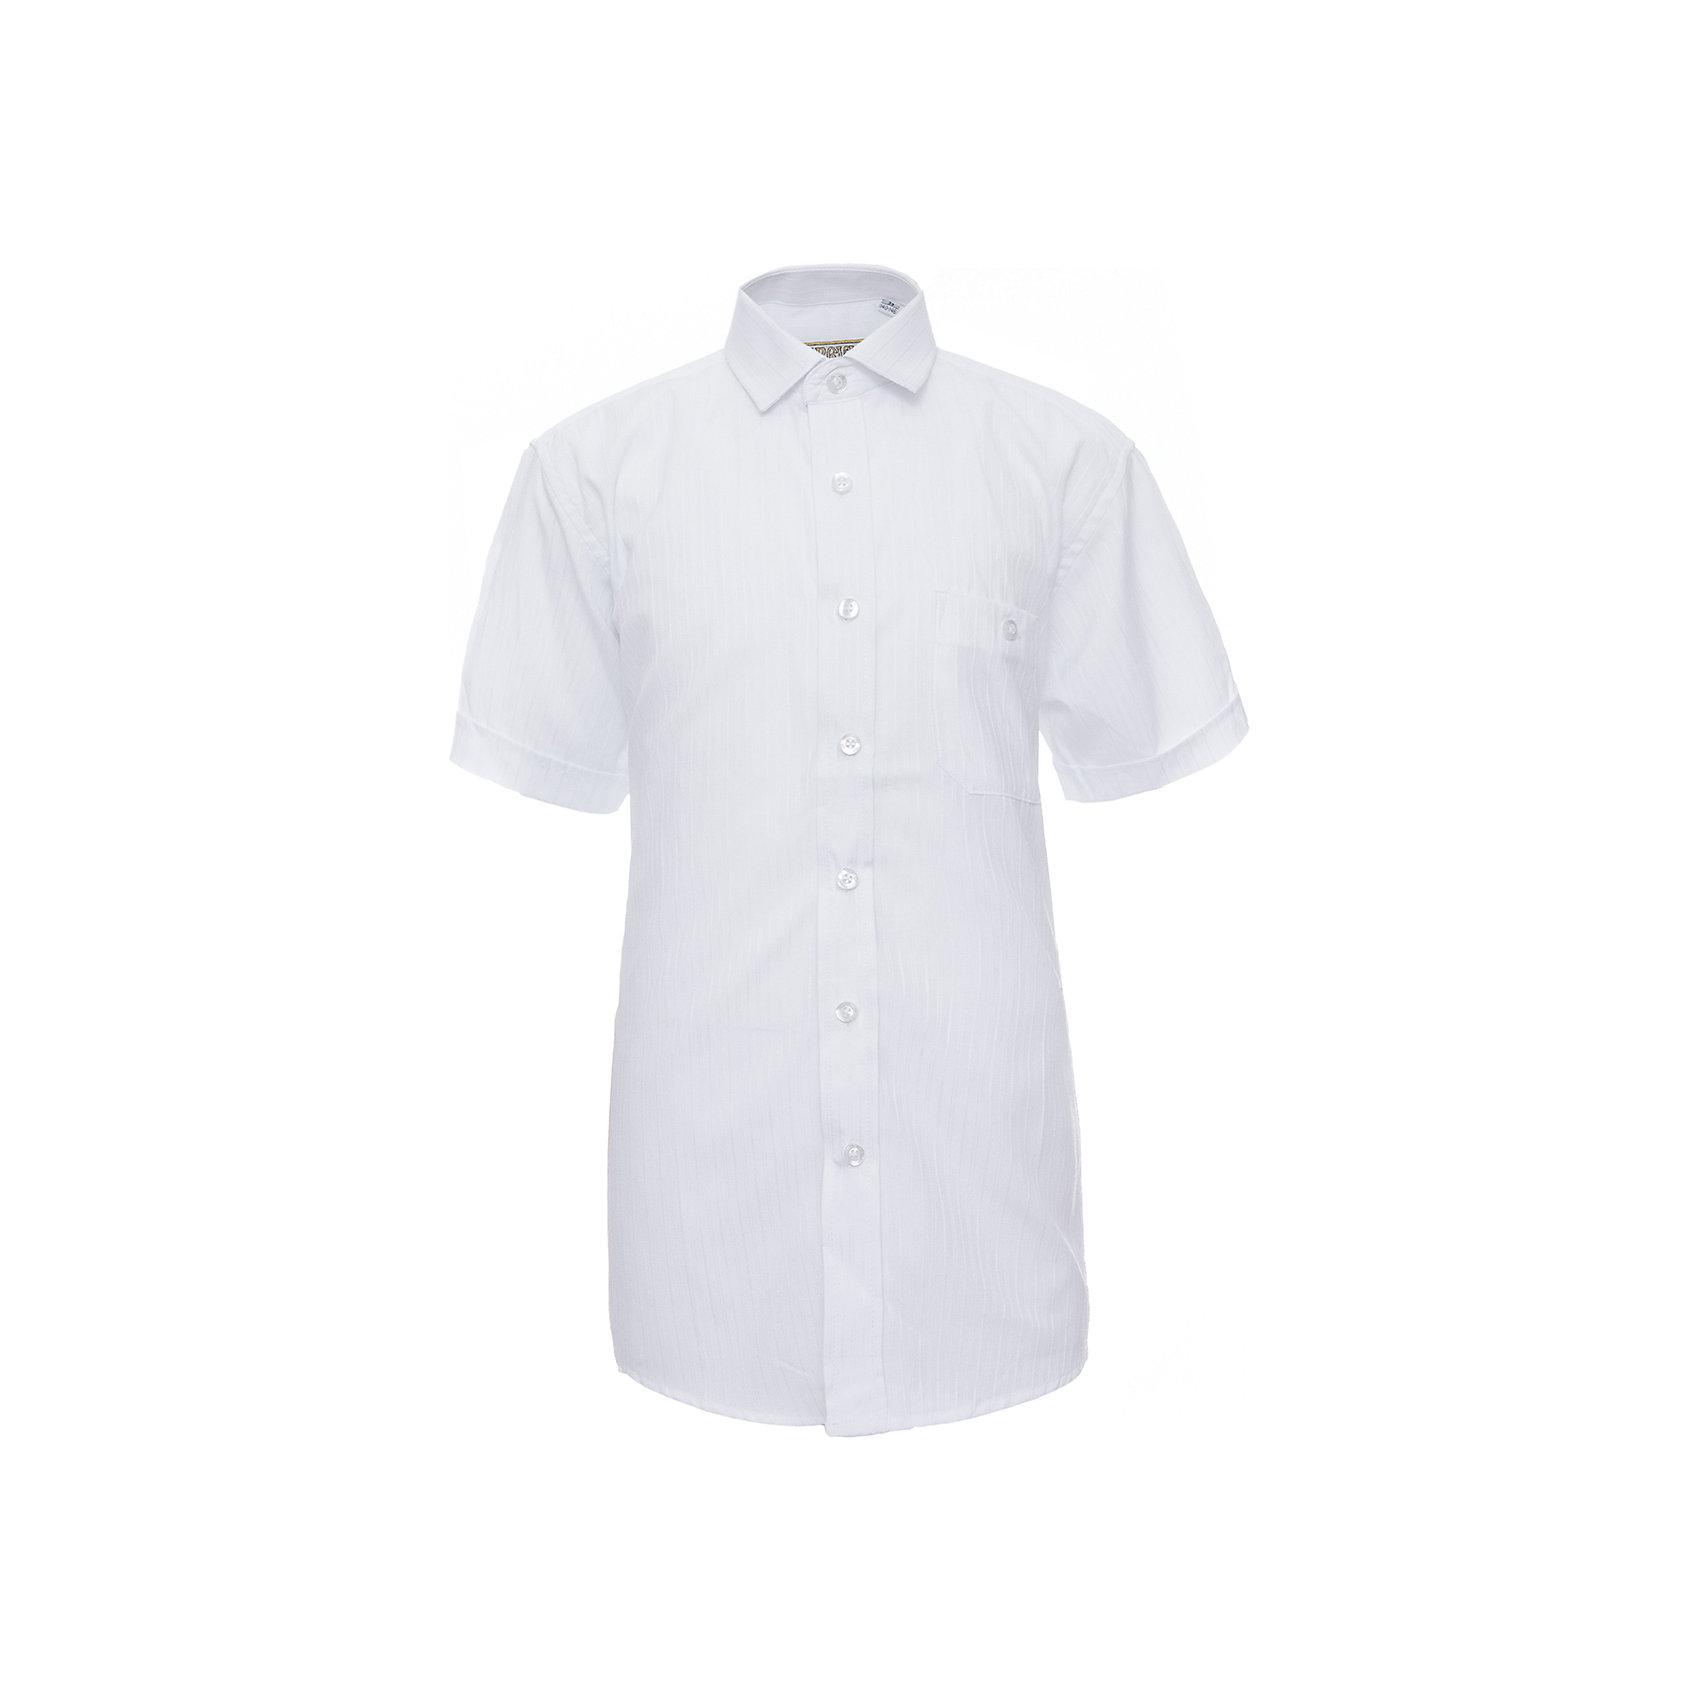 Рубашка для мальчика  TsarevichБлузки и рубашки<br>Рубашка для мальчика от российской марки Tsarevich.<br>Состав:<br>65% хлопок 35% полиэстер<br><br>Ширина мм: 174<br>Глубина мм: 10<br>Высота мм: 169<br>Вес г: 157<br>Цвет: белый<br>Возраст от месяцев: 132<br>Возраст до месяцев: 144<br>Пол: Мужской<br>Возраст: Детский<br>Размер: 146/152,122/128,134/140,164/170,158/164,152/158,140/146,128/134<br>SKU: 4163584